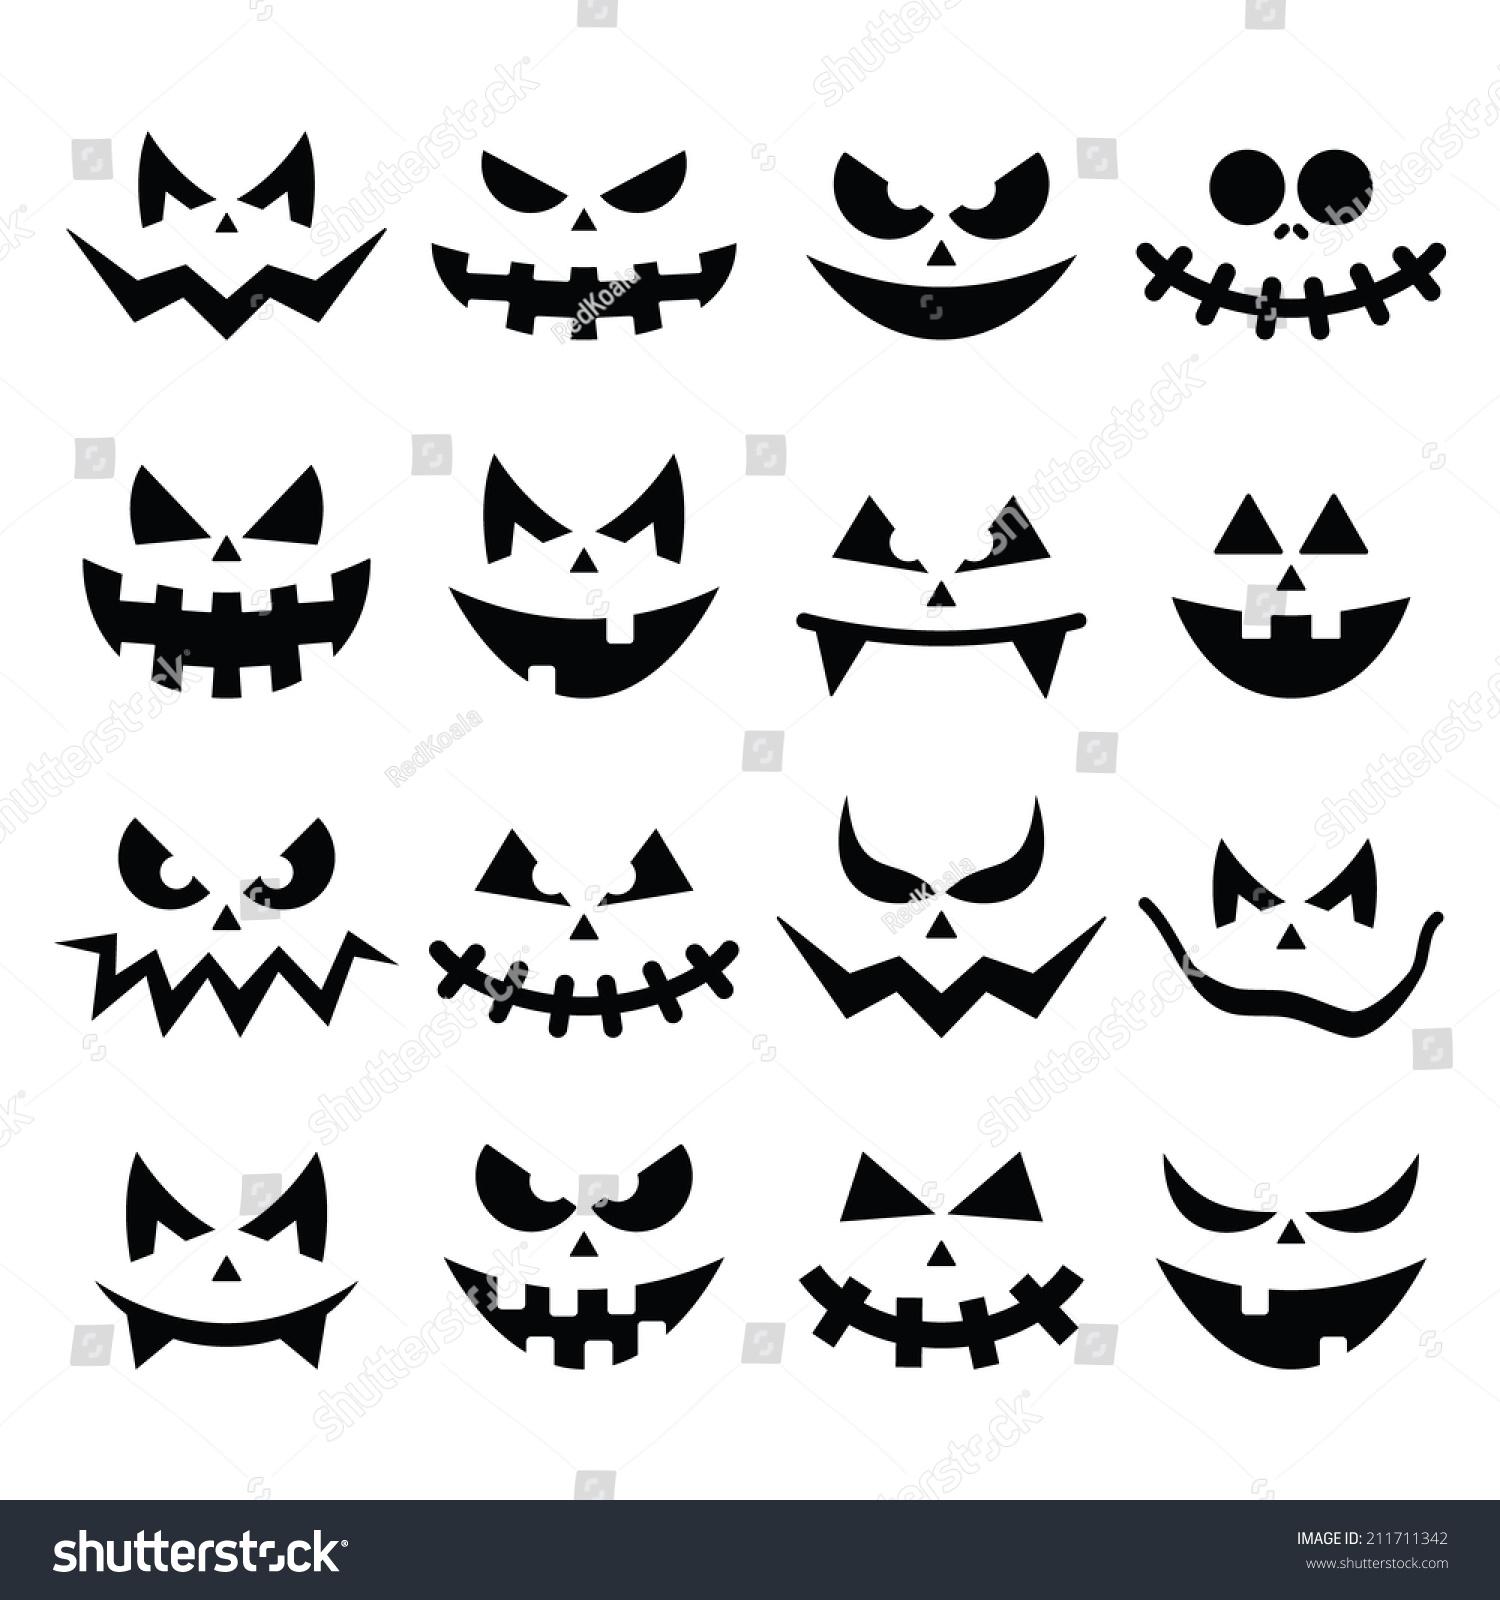 Scary halloween pumpkin faces icons set stock vector for Evil pumpkin face template